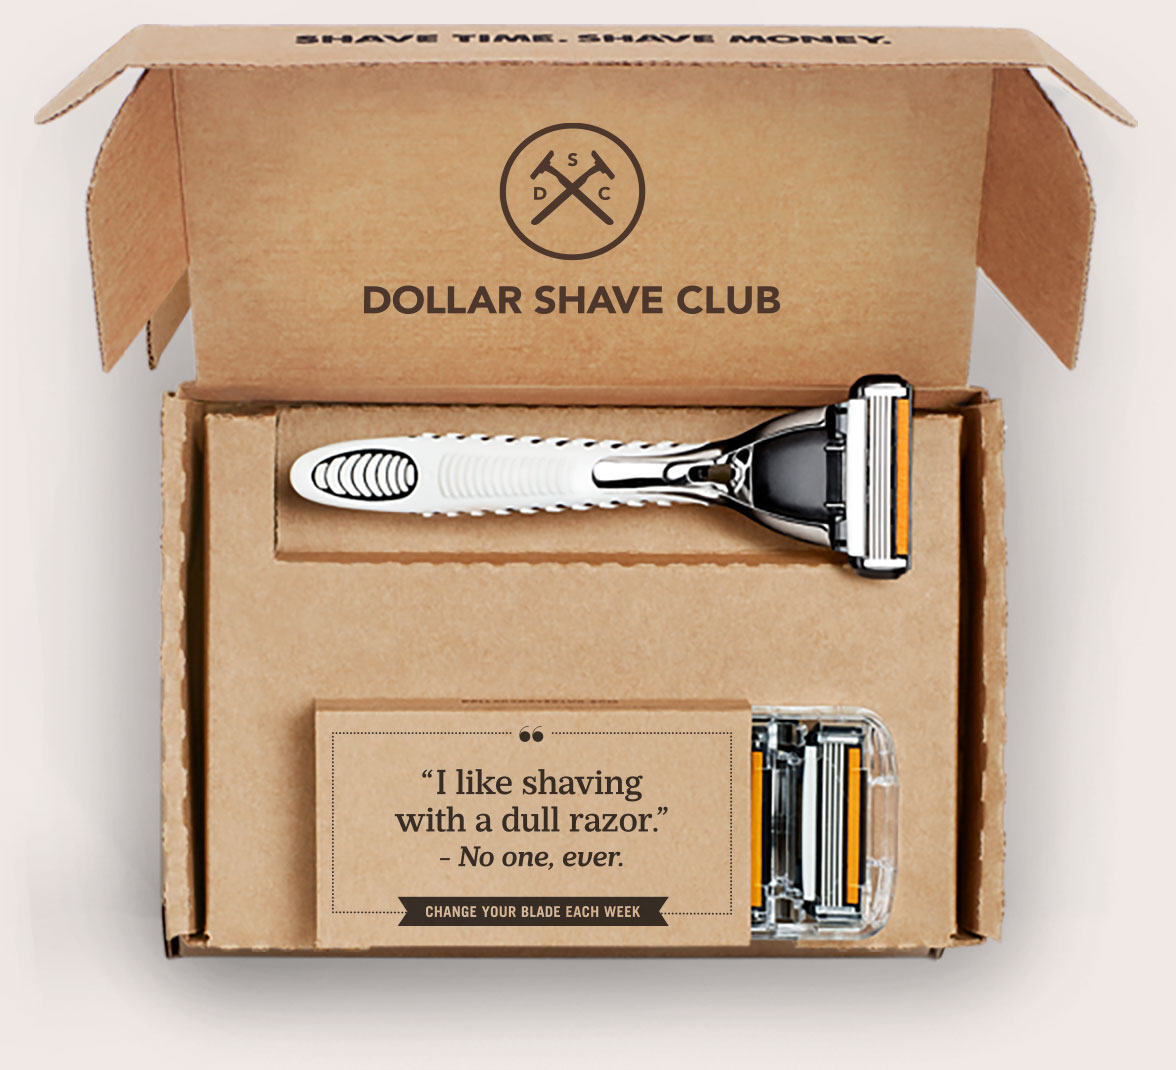 innovation-dollar-shave-club